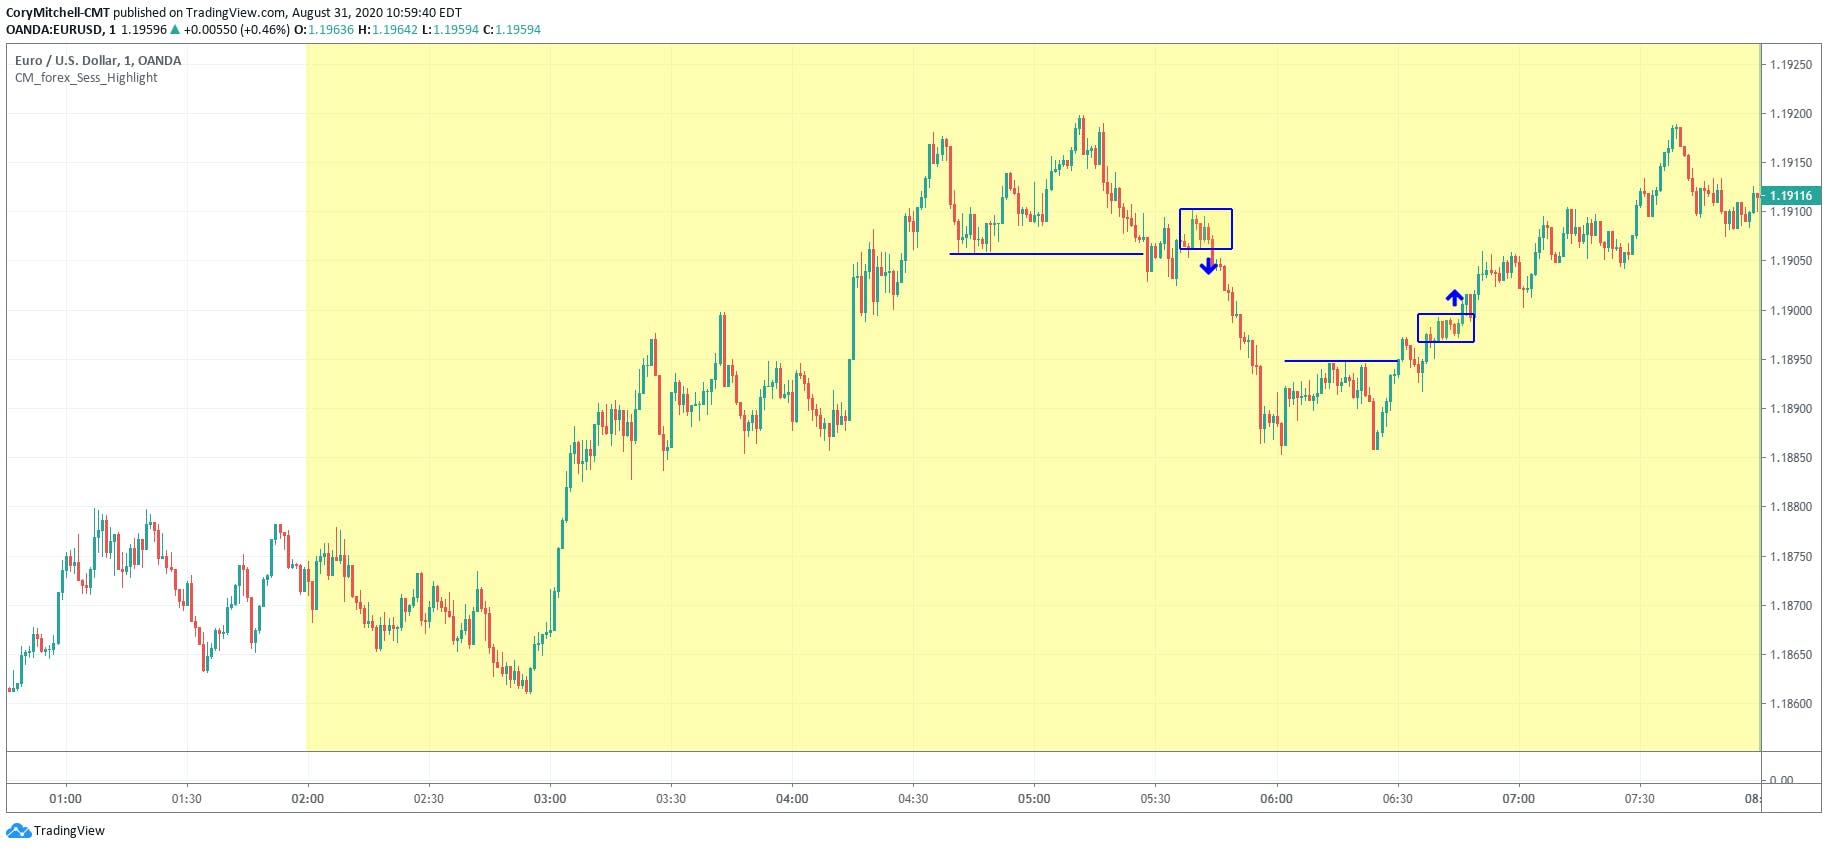 EURUSD 1-minute technical turnaround strategy